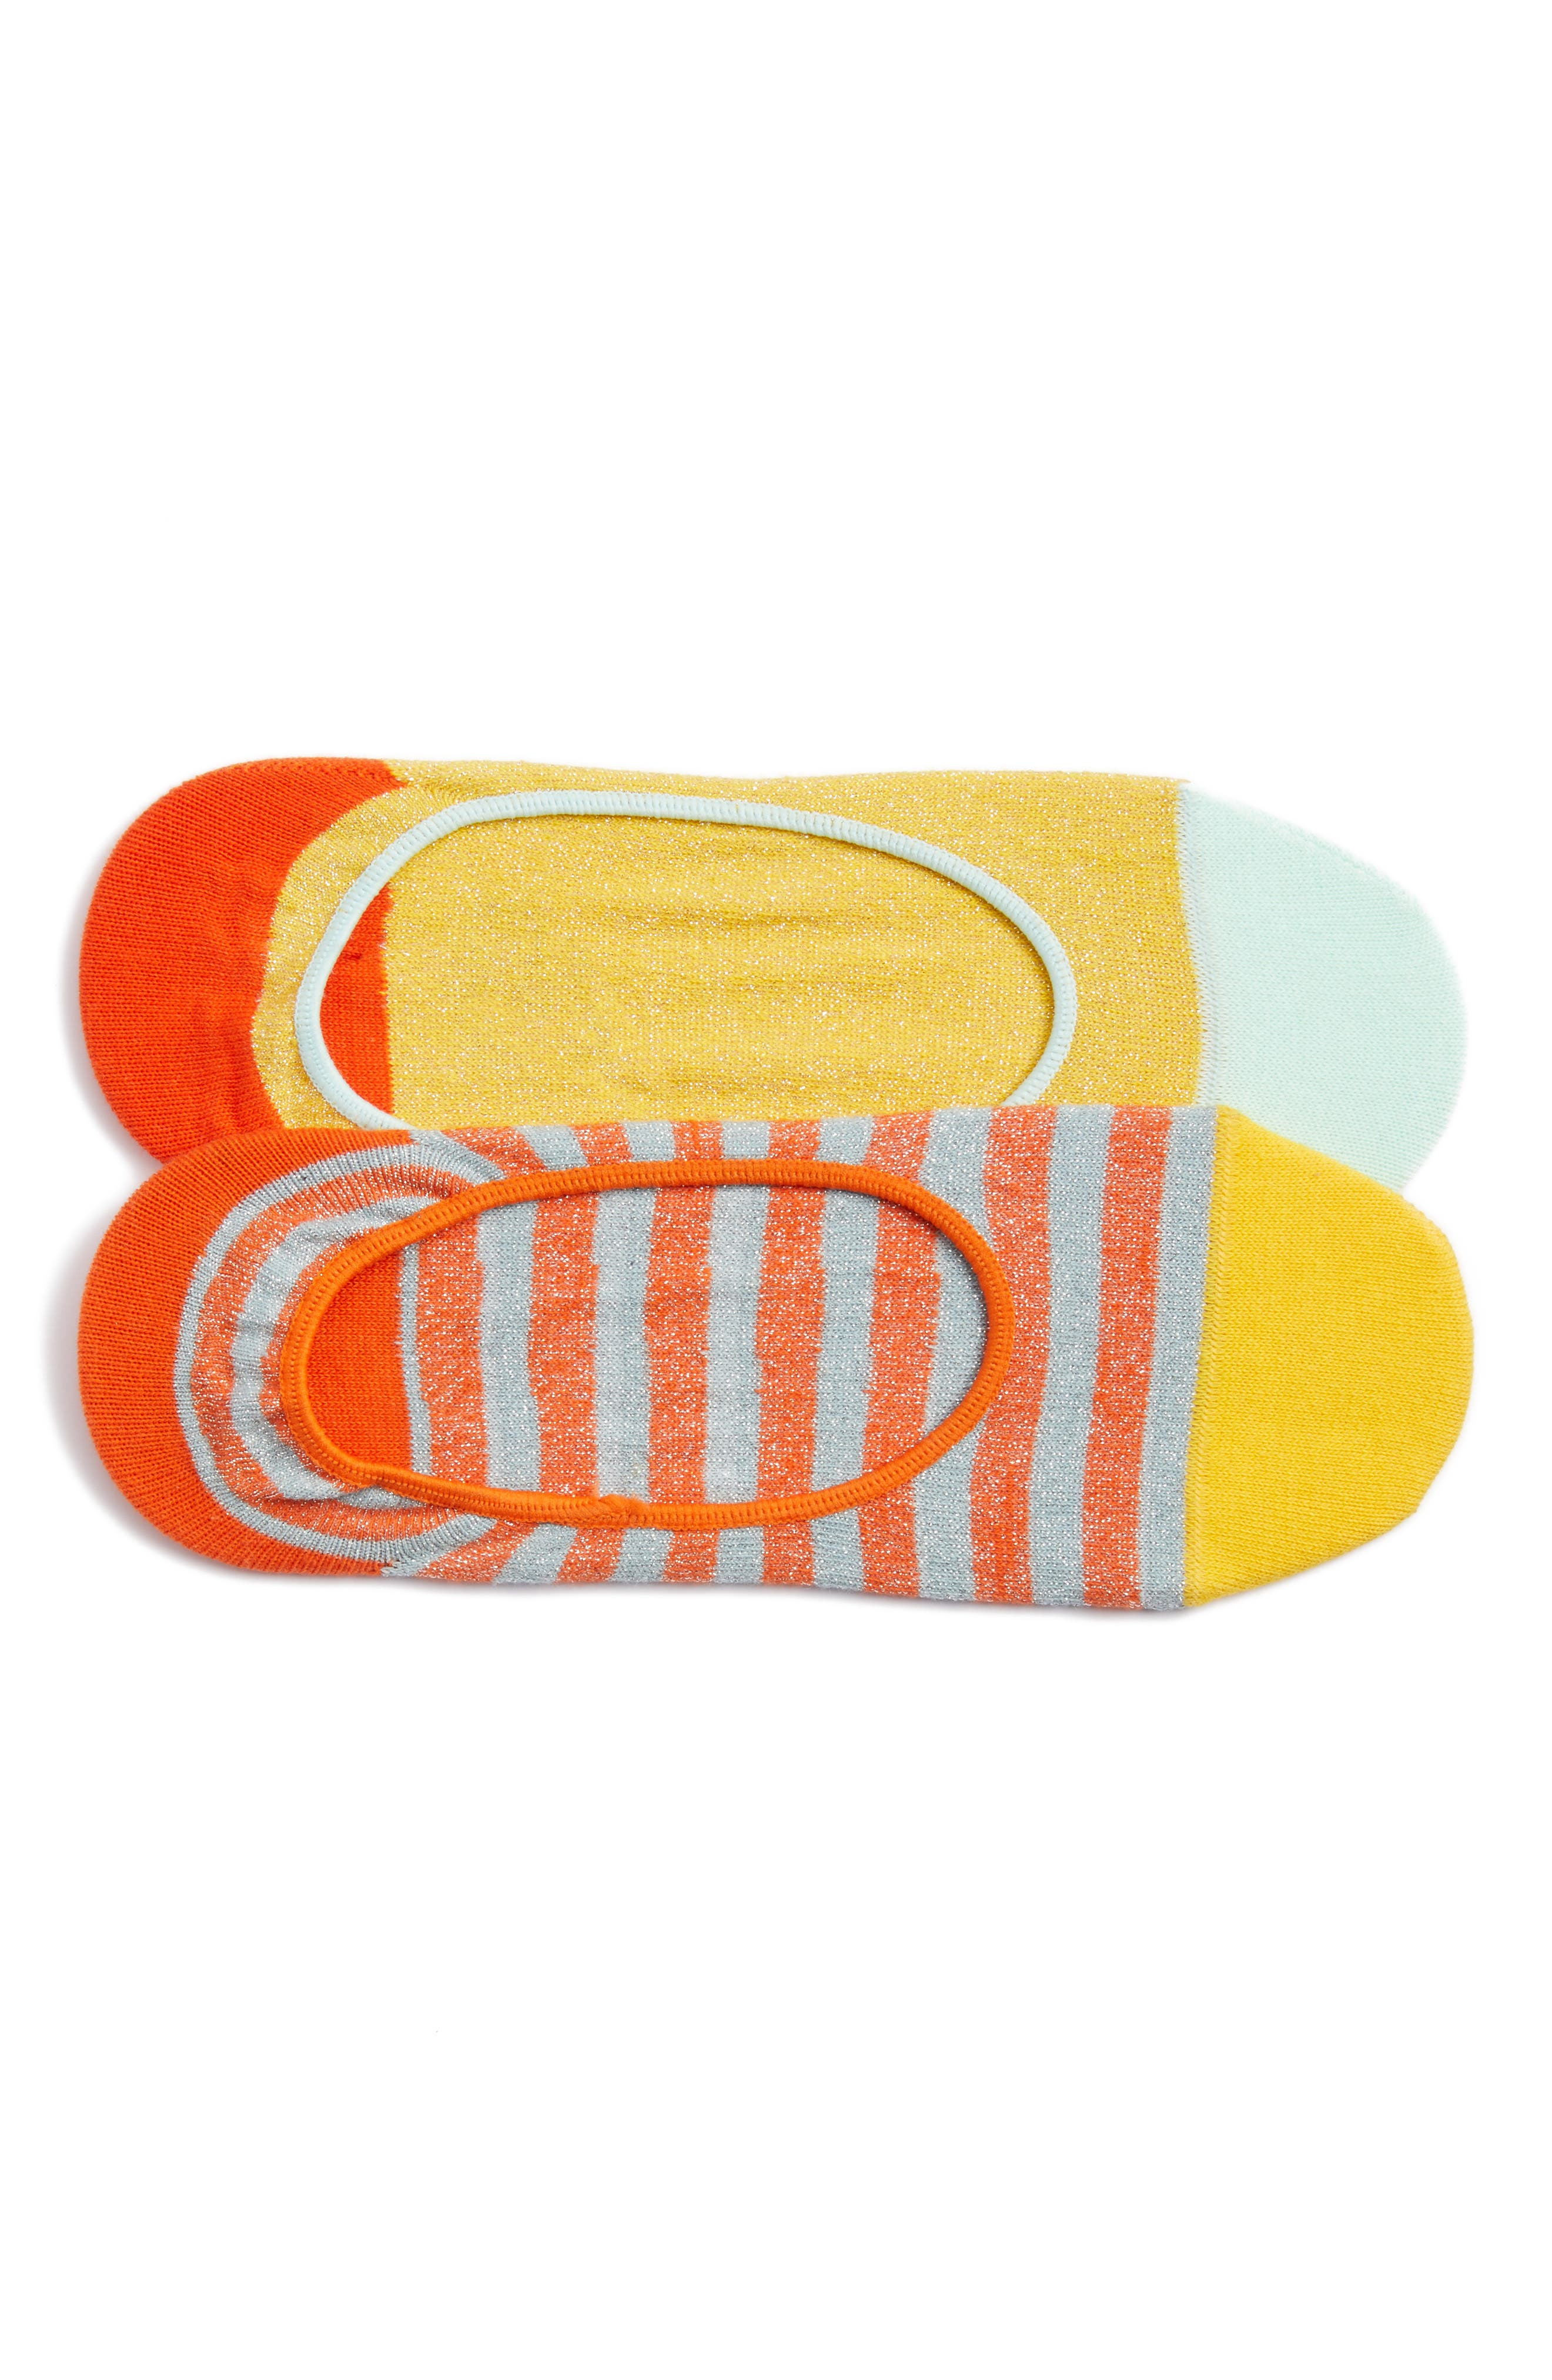 2-Pack Claudia No-Show Socks,                             Main thumbnail 1, color,                             ORANGE